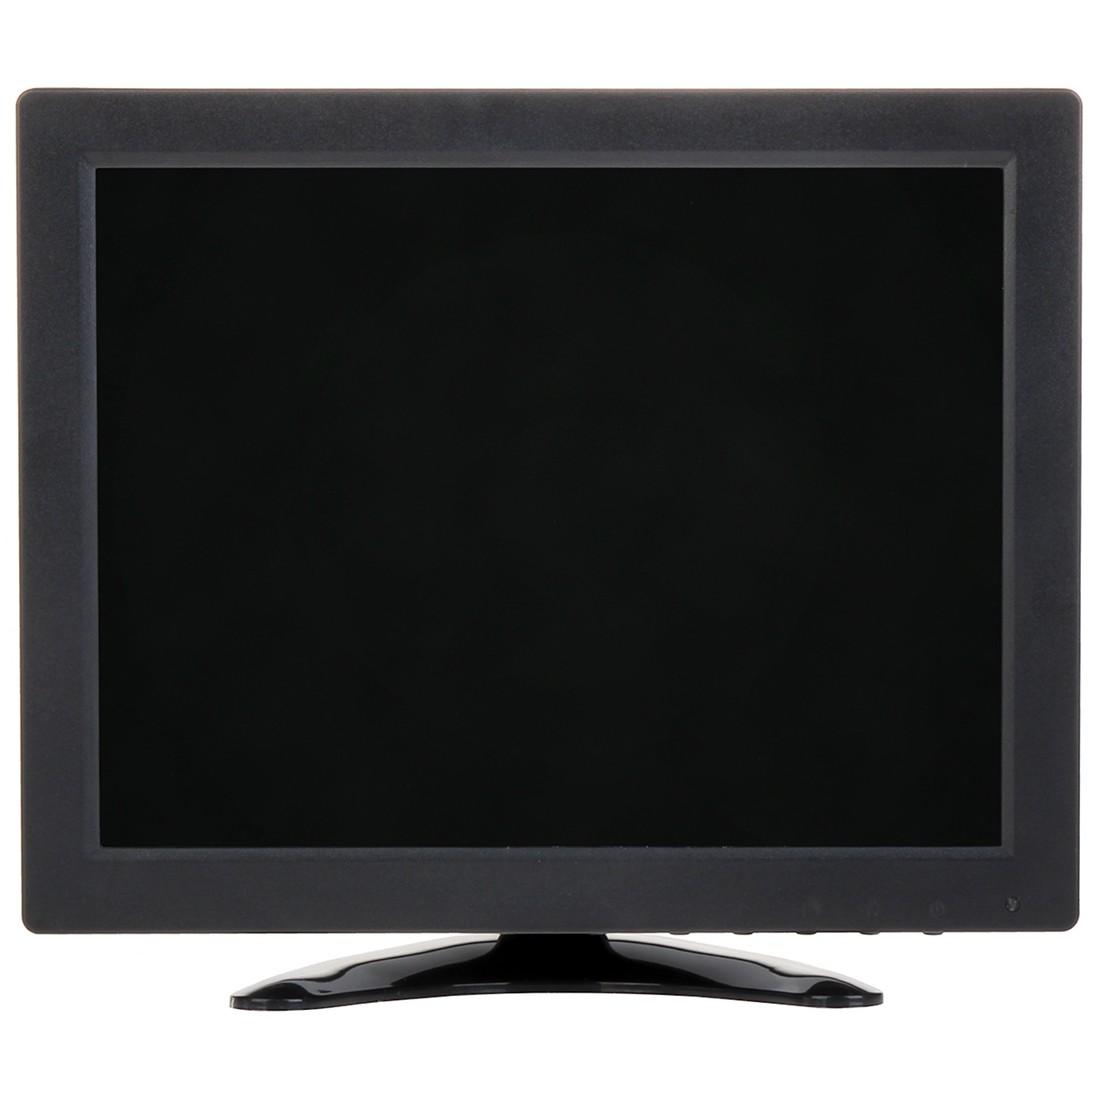 "MONITOR VGA, HDMI, AUDIO, 2XVIDEO, USB, DIALKOVÝ OVLÁDAC TFT-10/CCTV 10 """